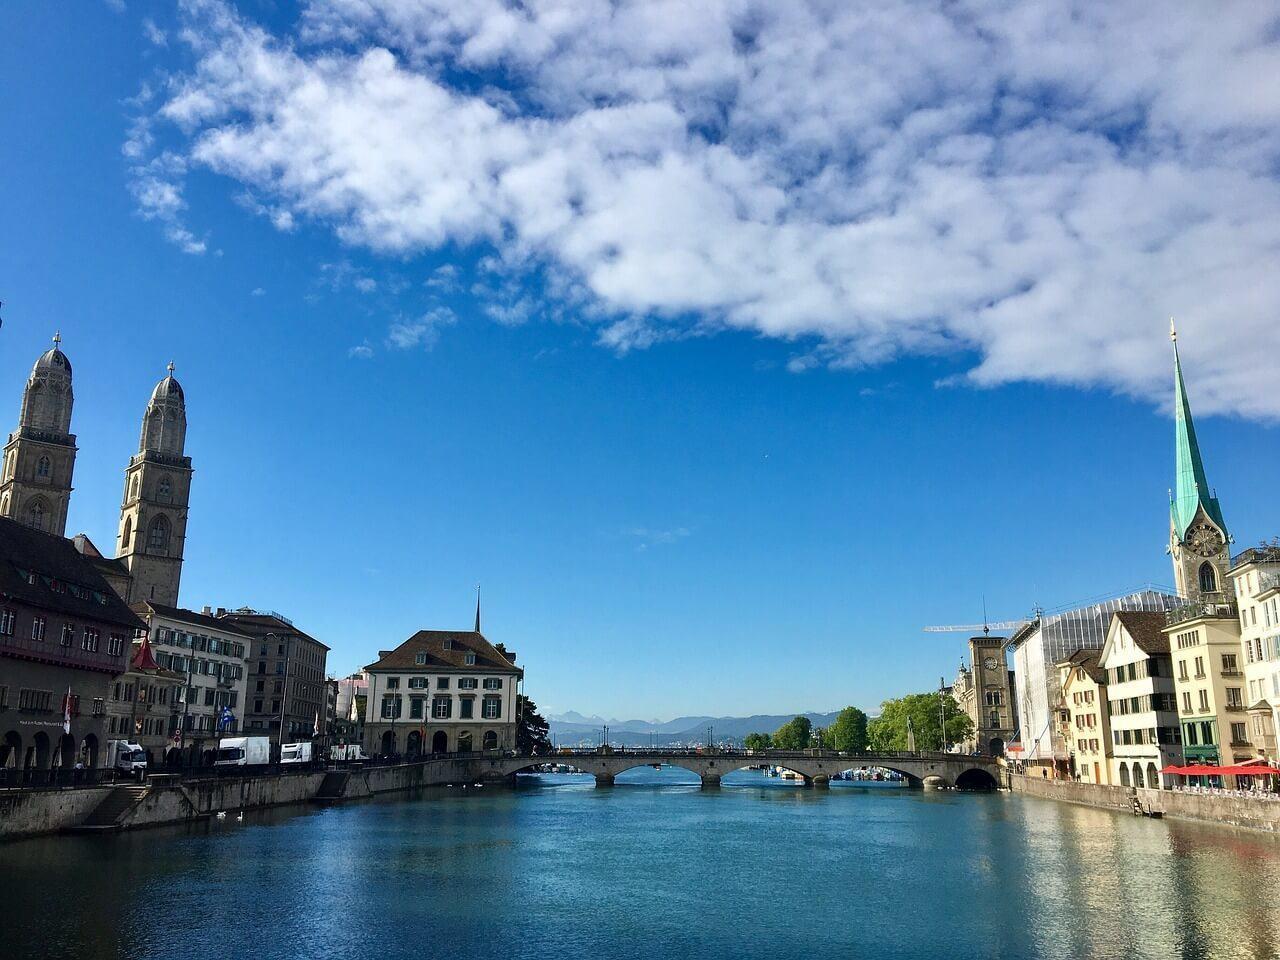 Zurich – Overall Best Place to Stay in Switzerland